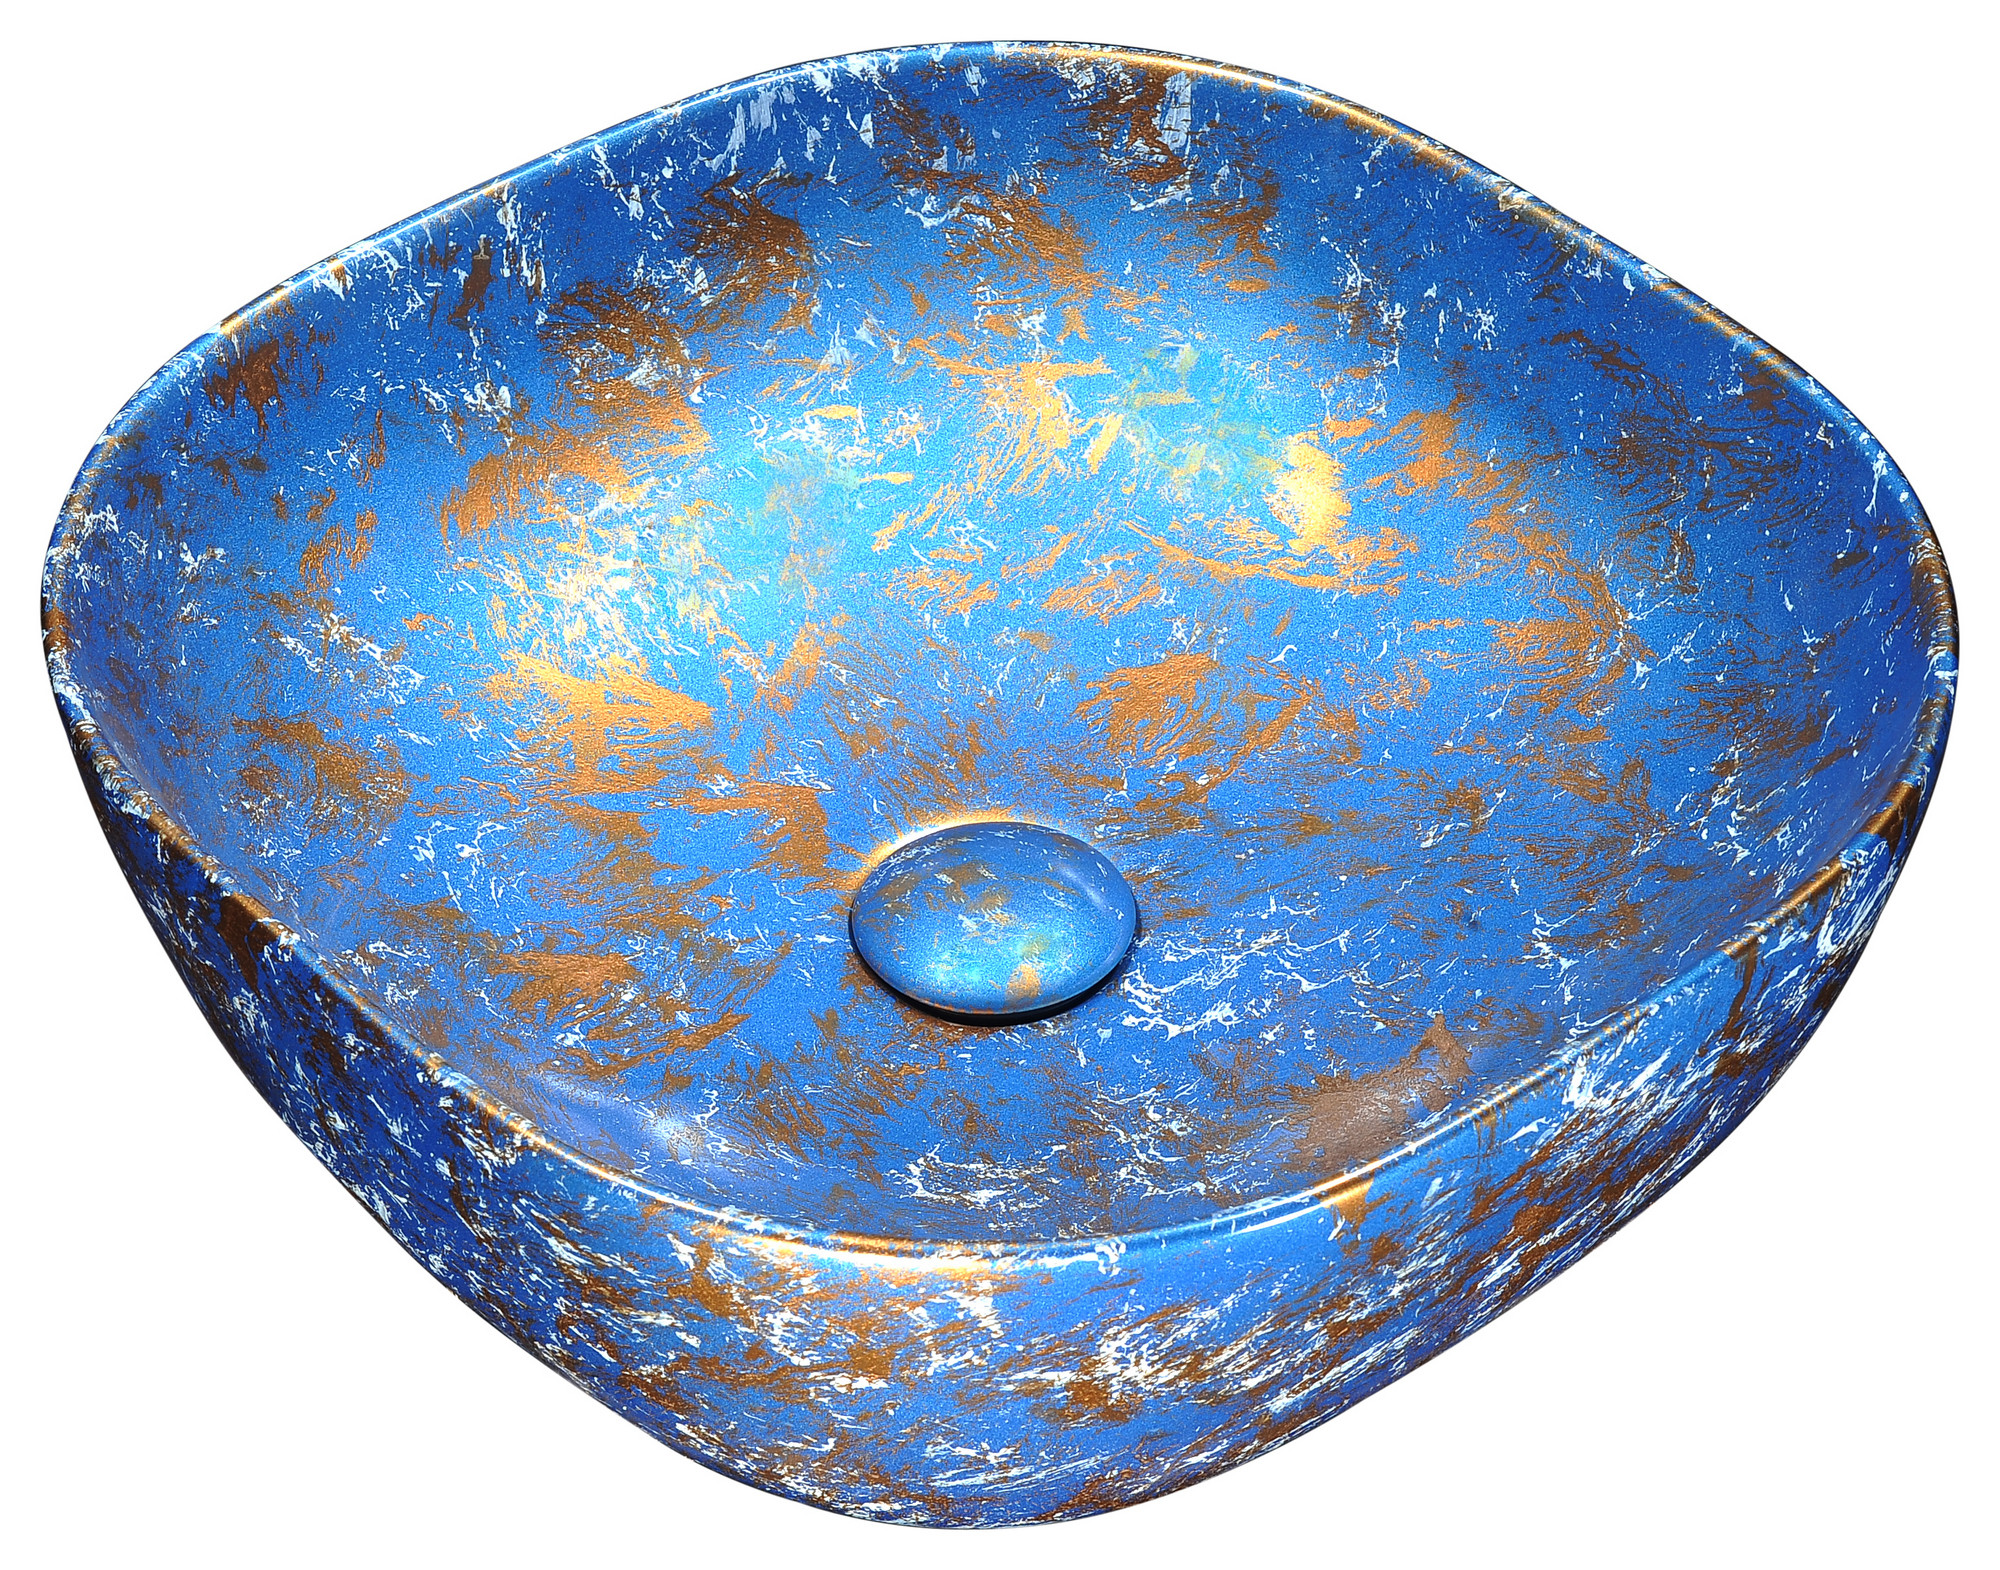 ANZZI LS-AZ253 Marbled Series Ceramic Vessel Sink In Marbled Tulip Finish